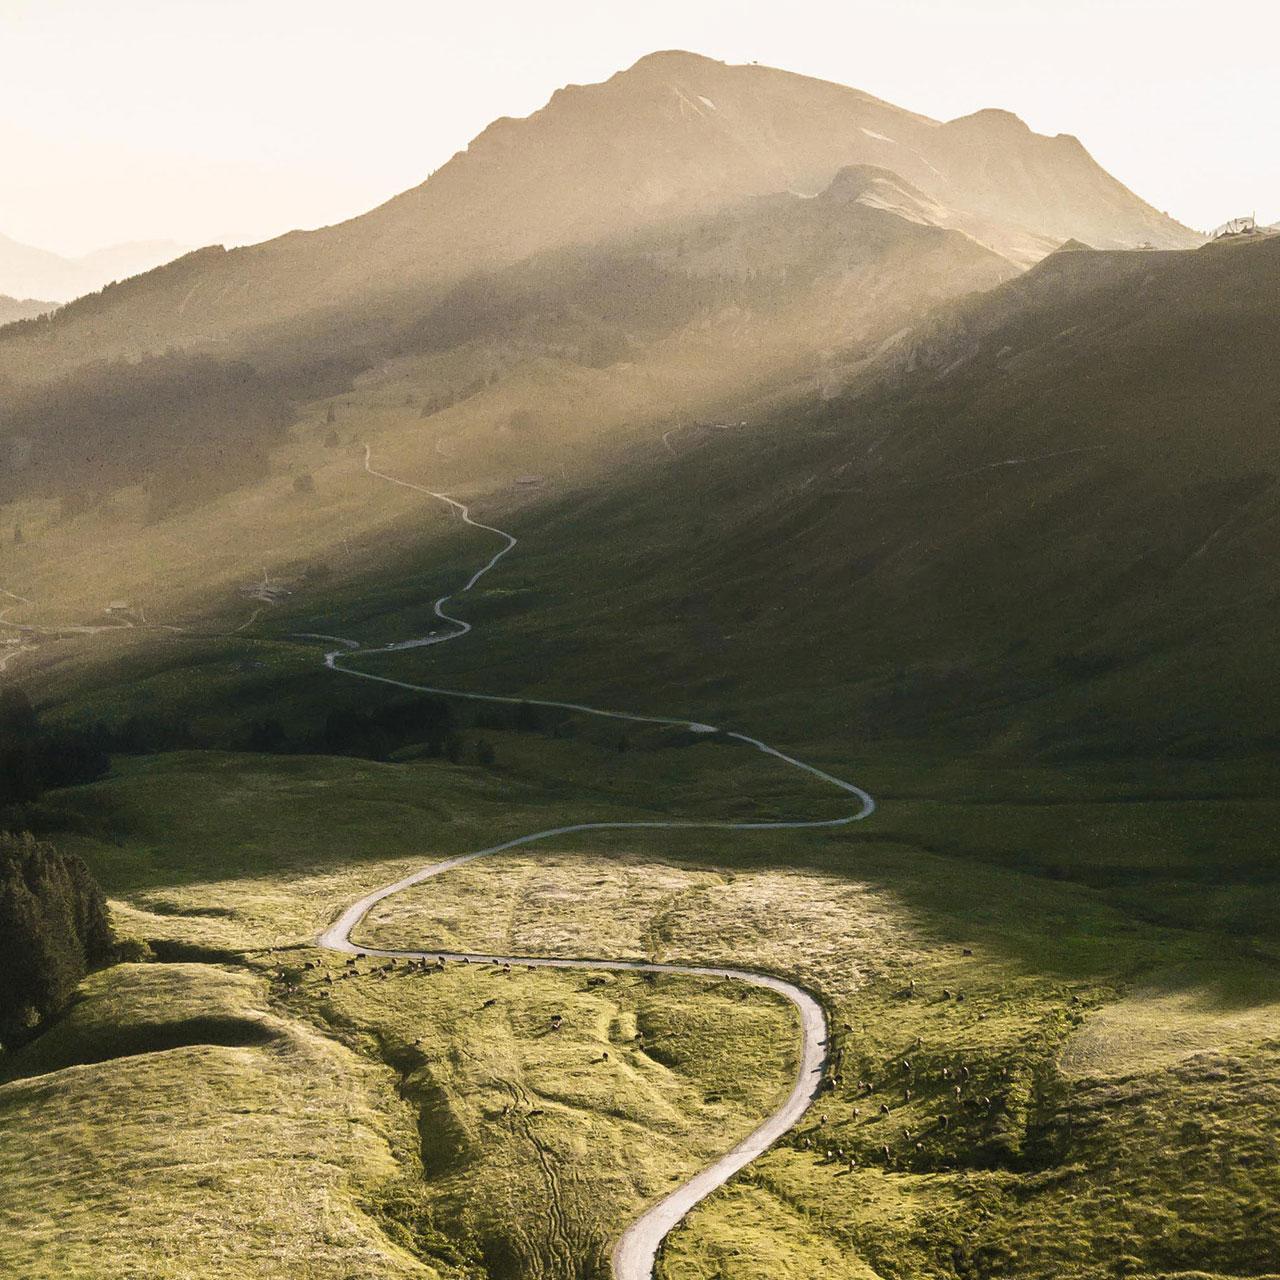 vallee-de-la-duche-c-hudry-le-grand-bornand-tourisme-bd-172059-web-223998